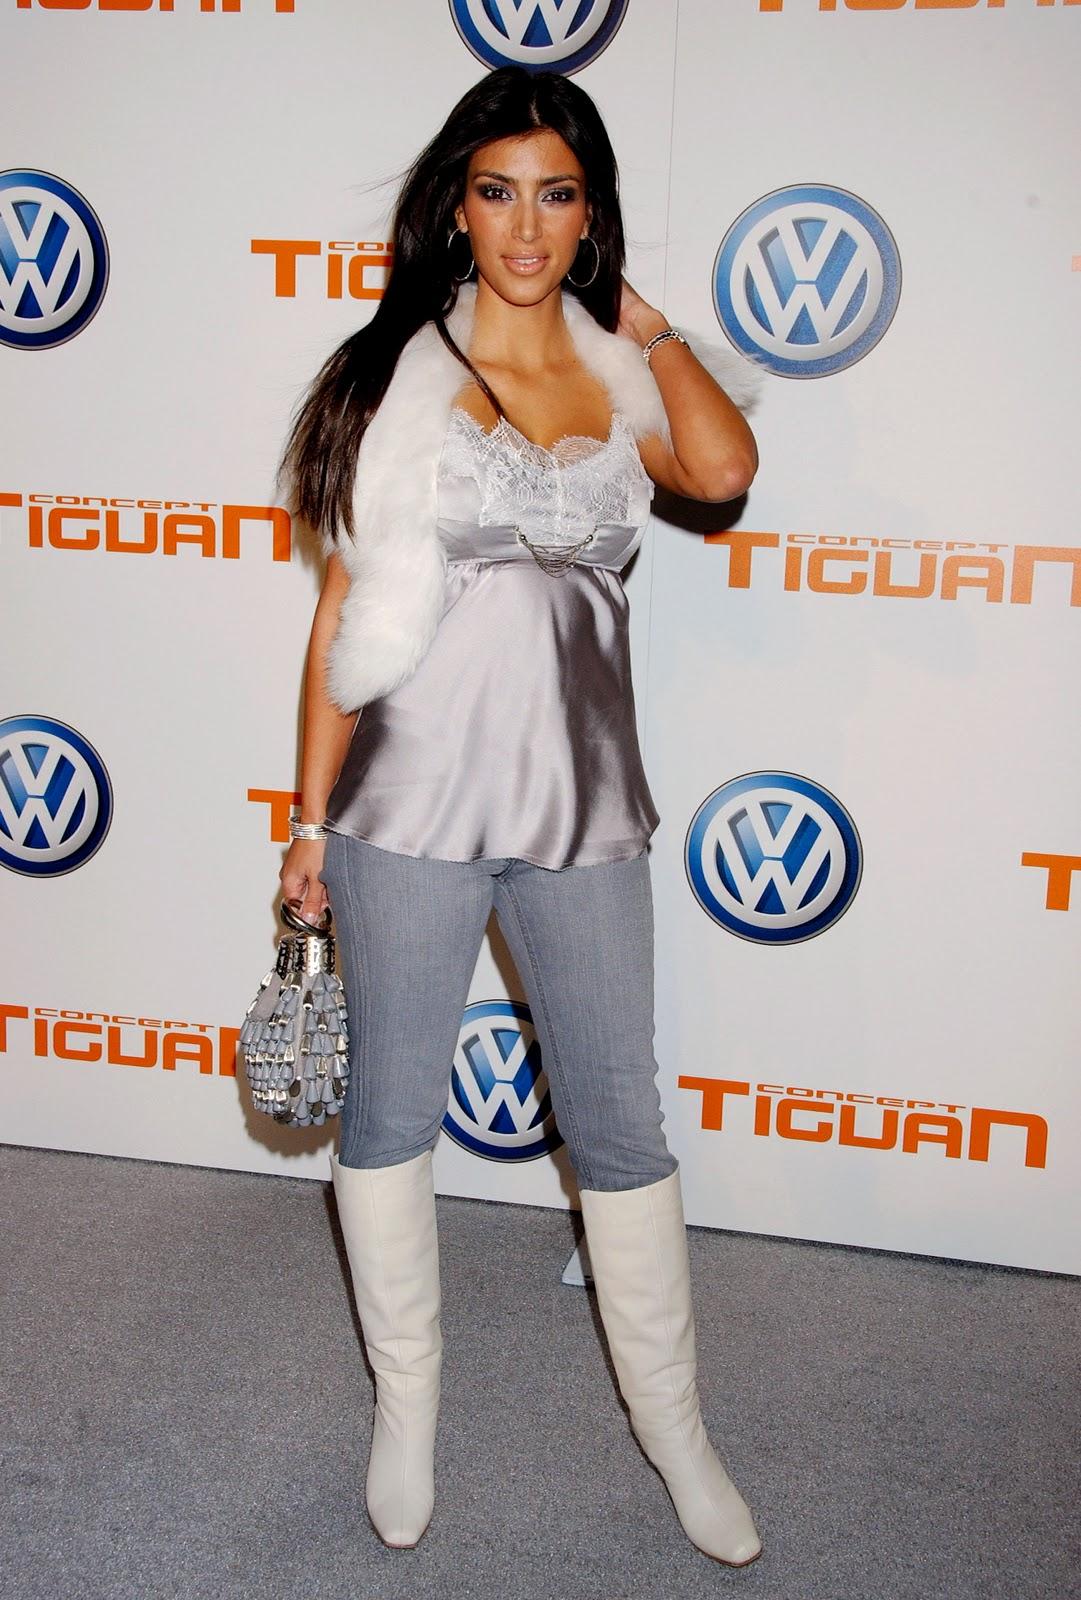 http://3.bp.blogspot.com/-60RMhhtcUWI/TxXnFLD6fjI/AAAAAAAACNM/uo5wIzV5Vsk/s1600/33182_HQCB.net_Kim_Kardashian_02_123_544lo.jpg